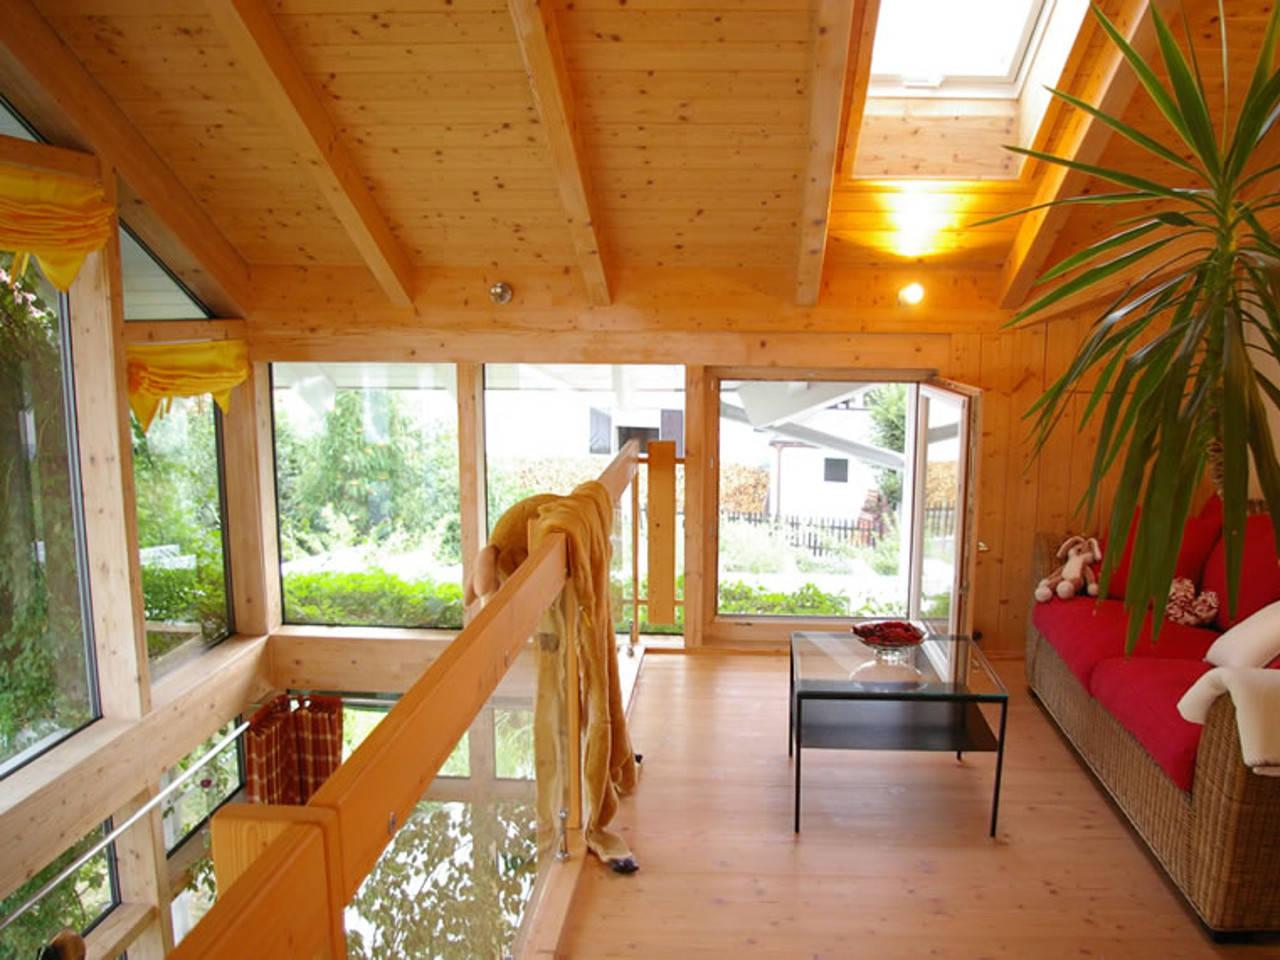 Galerie oben Igling